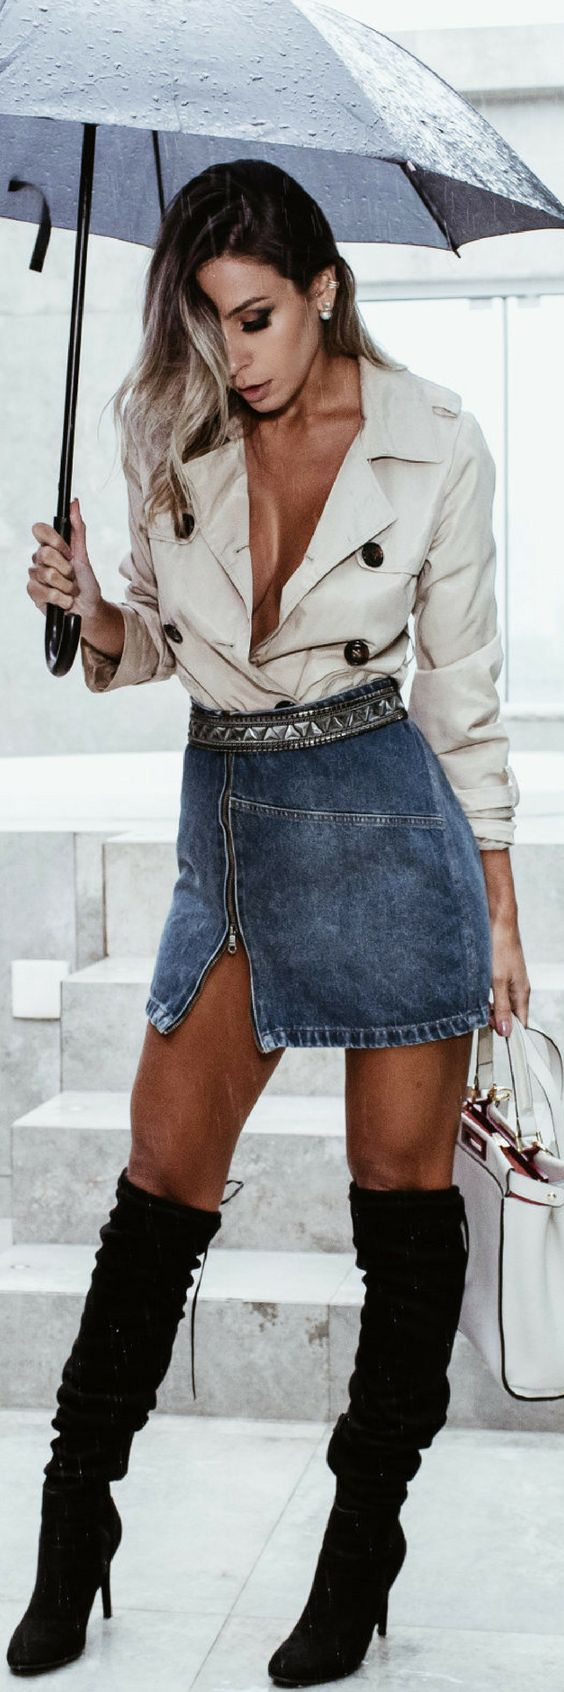 Summer Rain // Summer Outfit Idea by Vanessa Vasconcelos